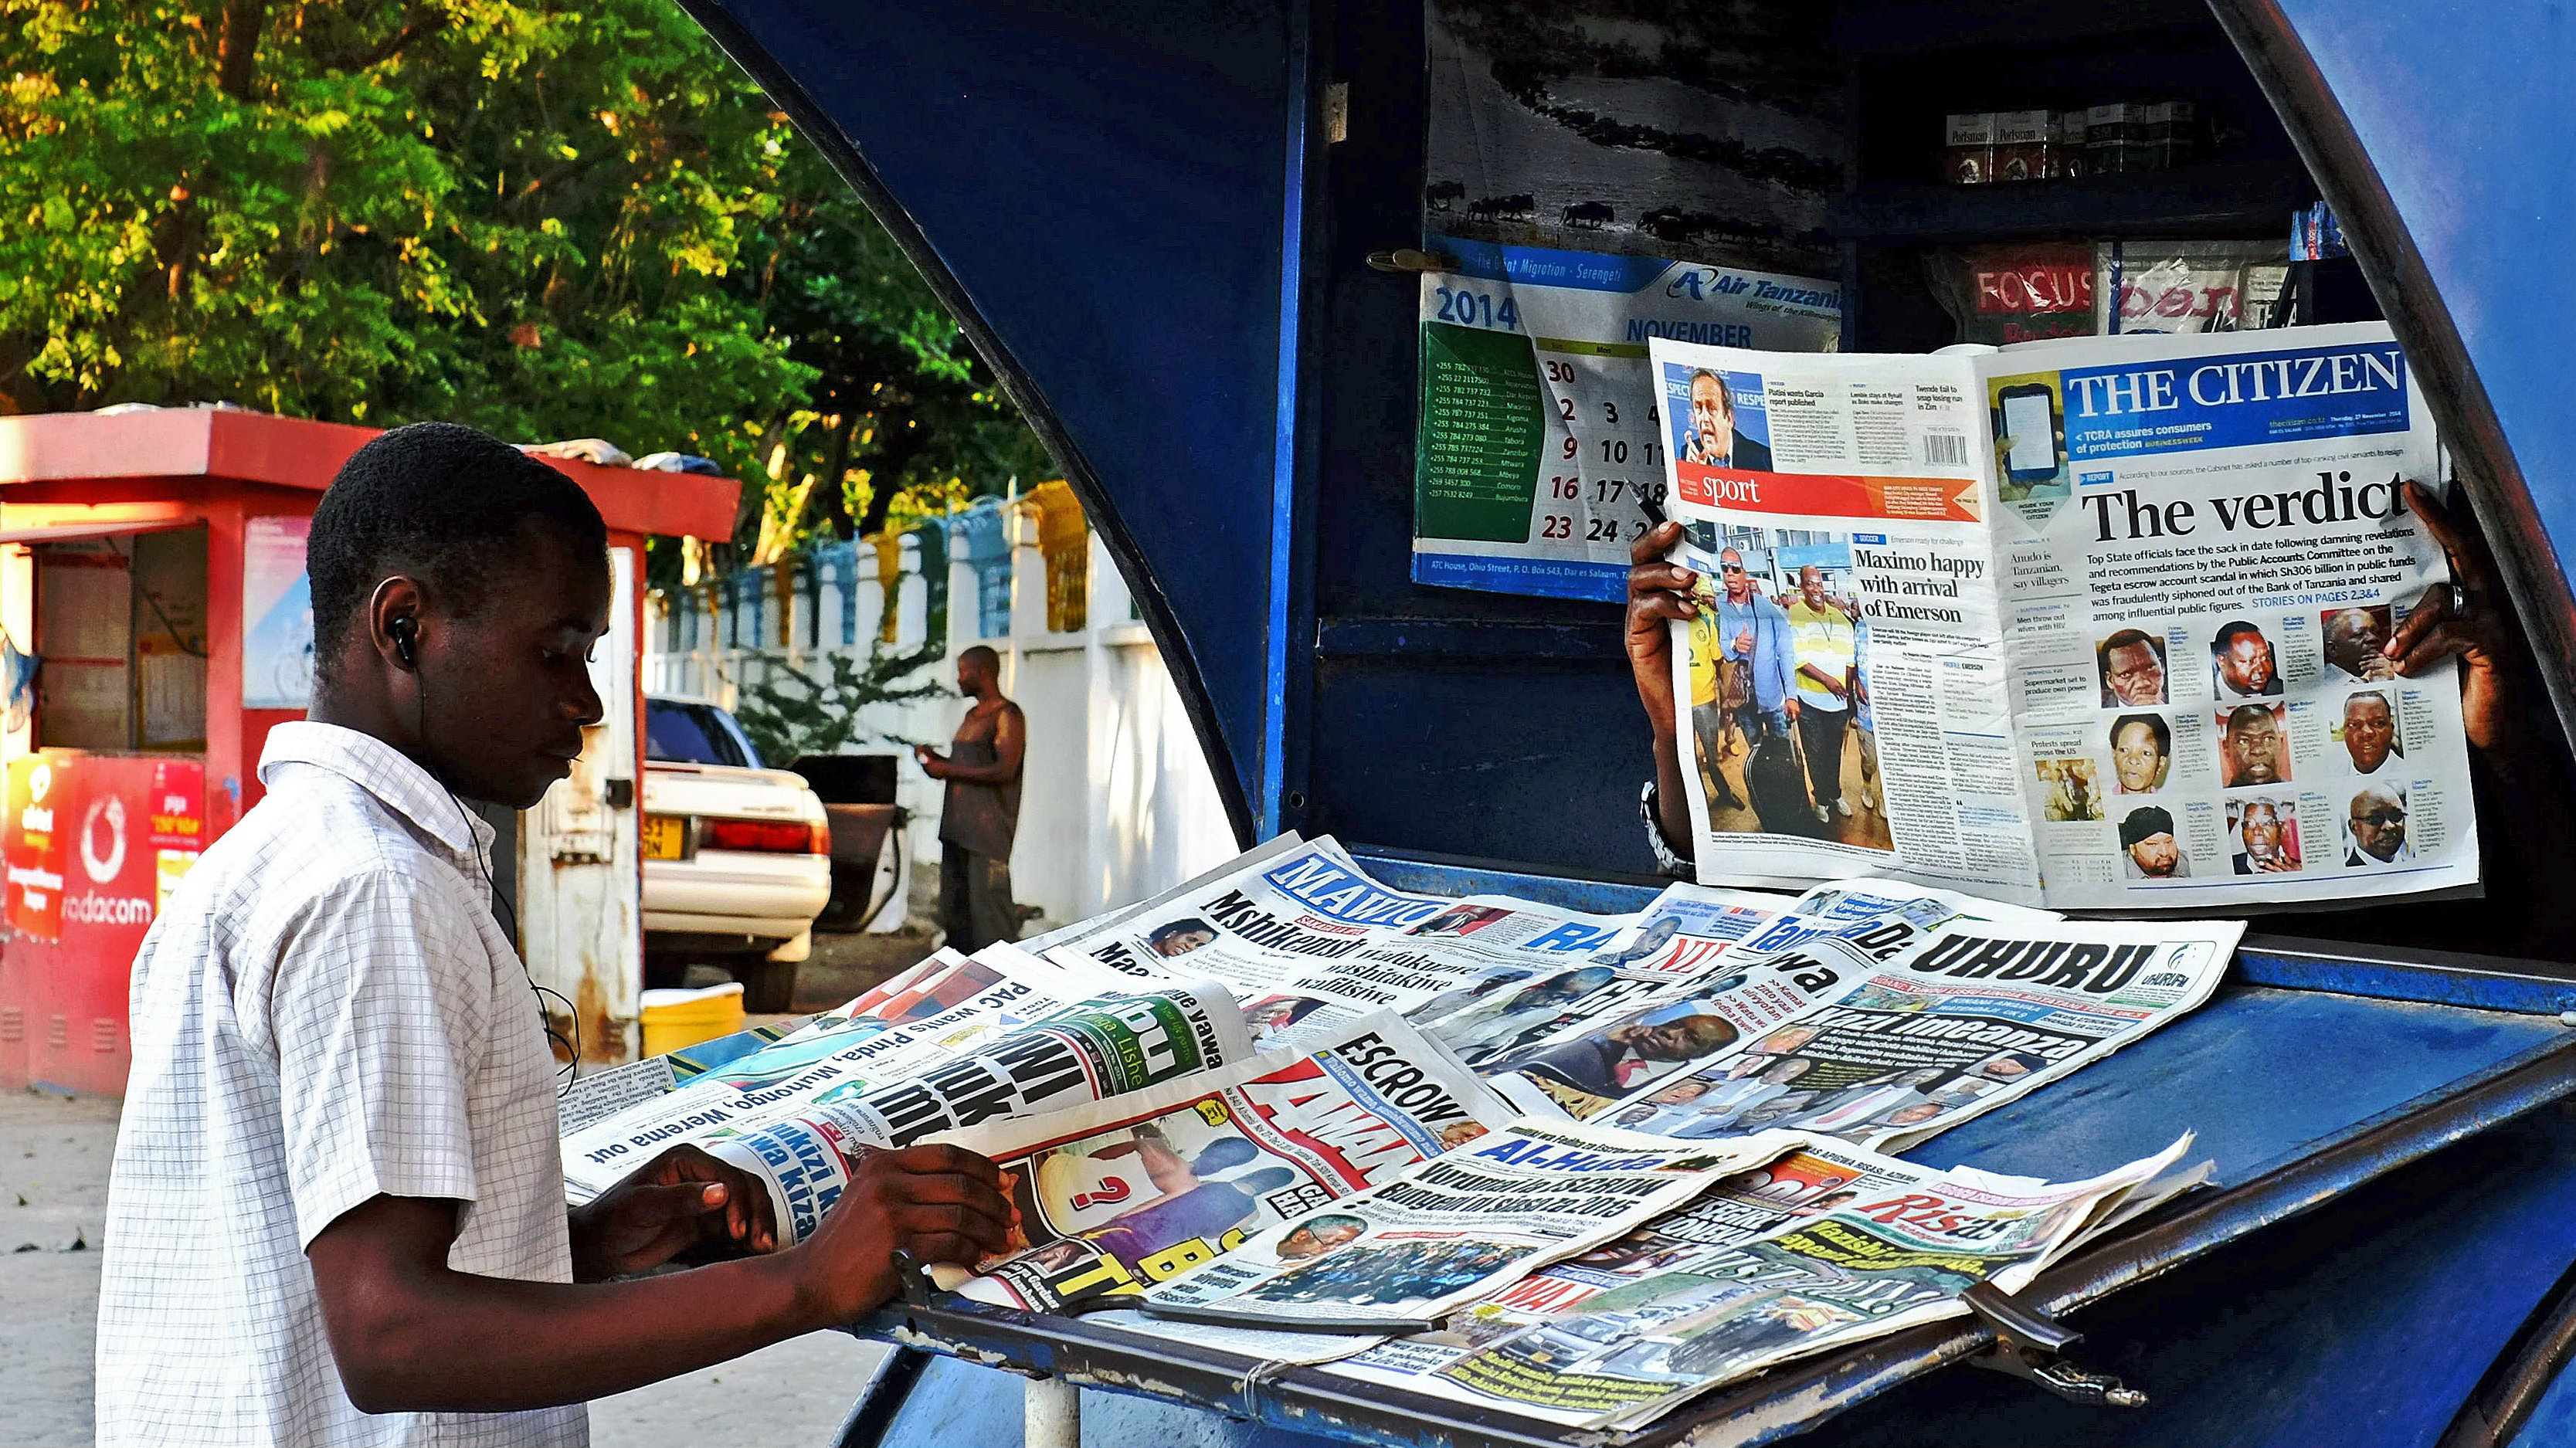 Tanzanian newspapers carry headlines on alleged corruption in Dar es Salaam, Tanzania on November 27, 2014